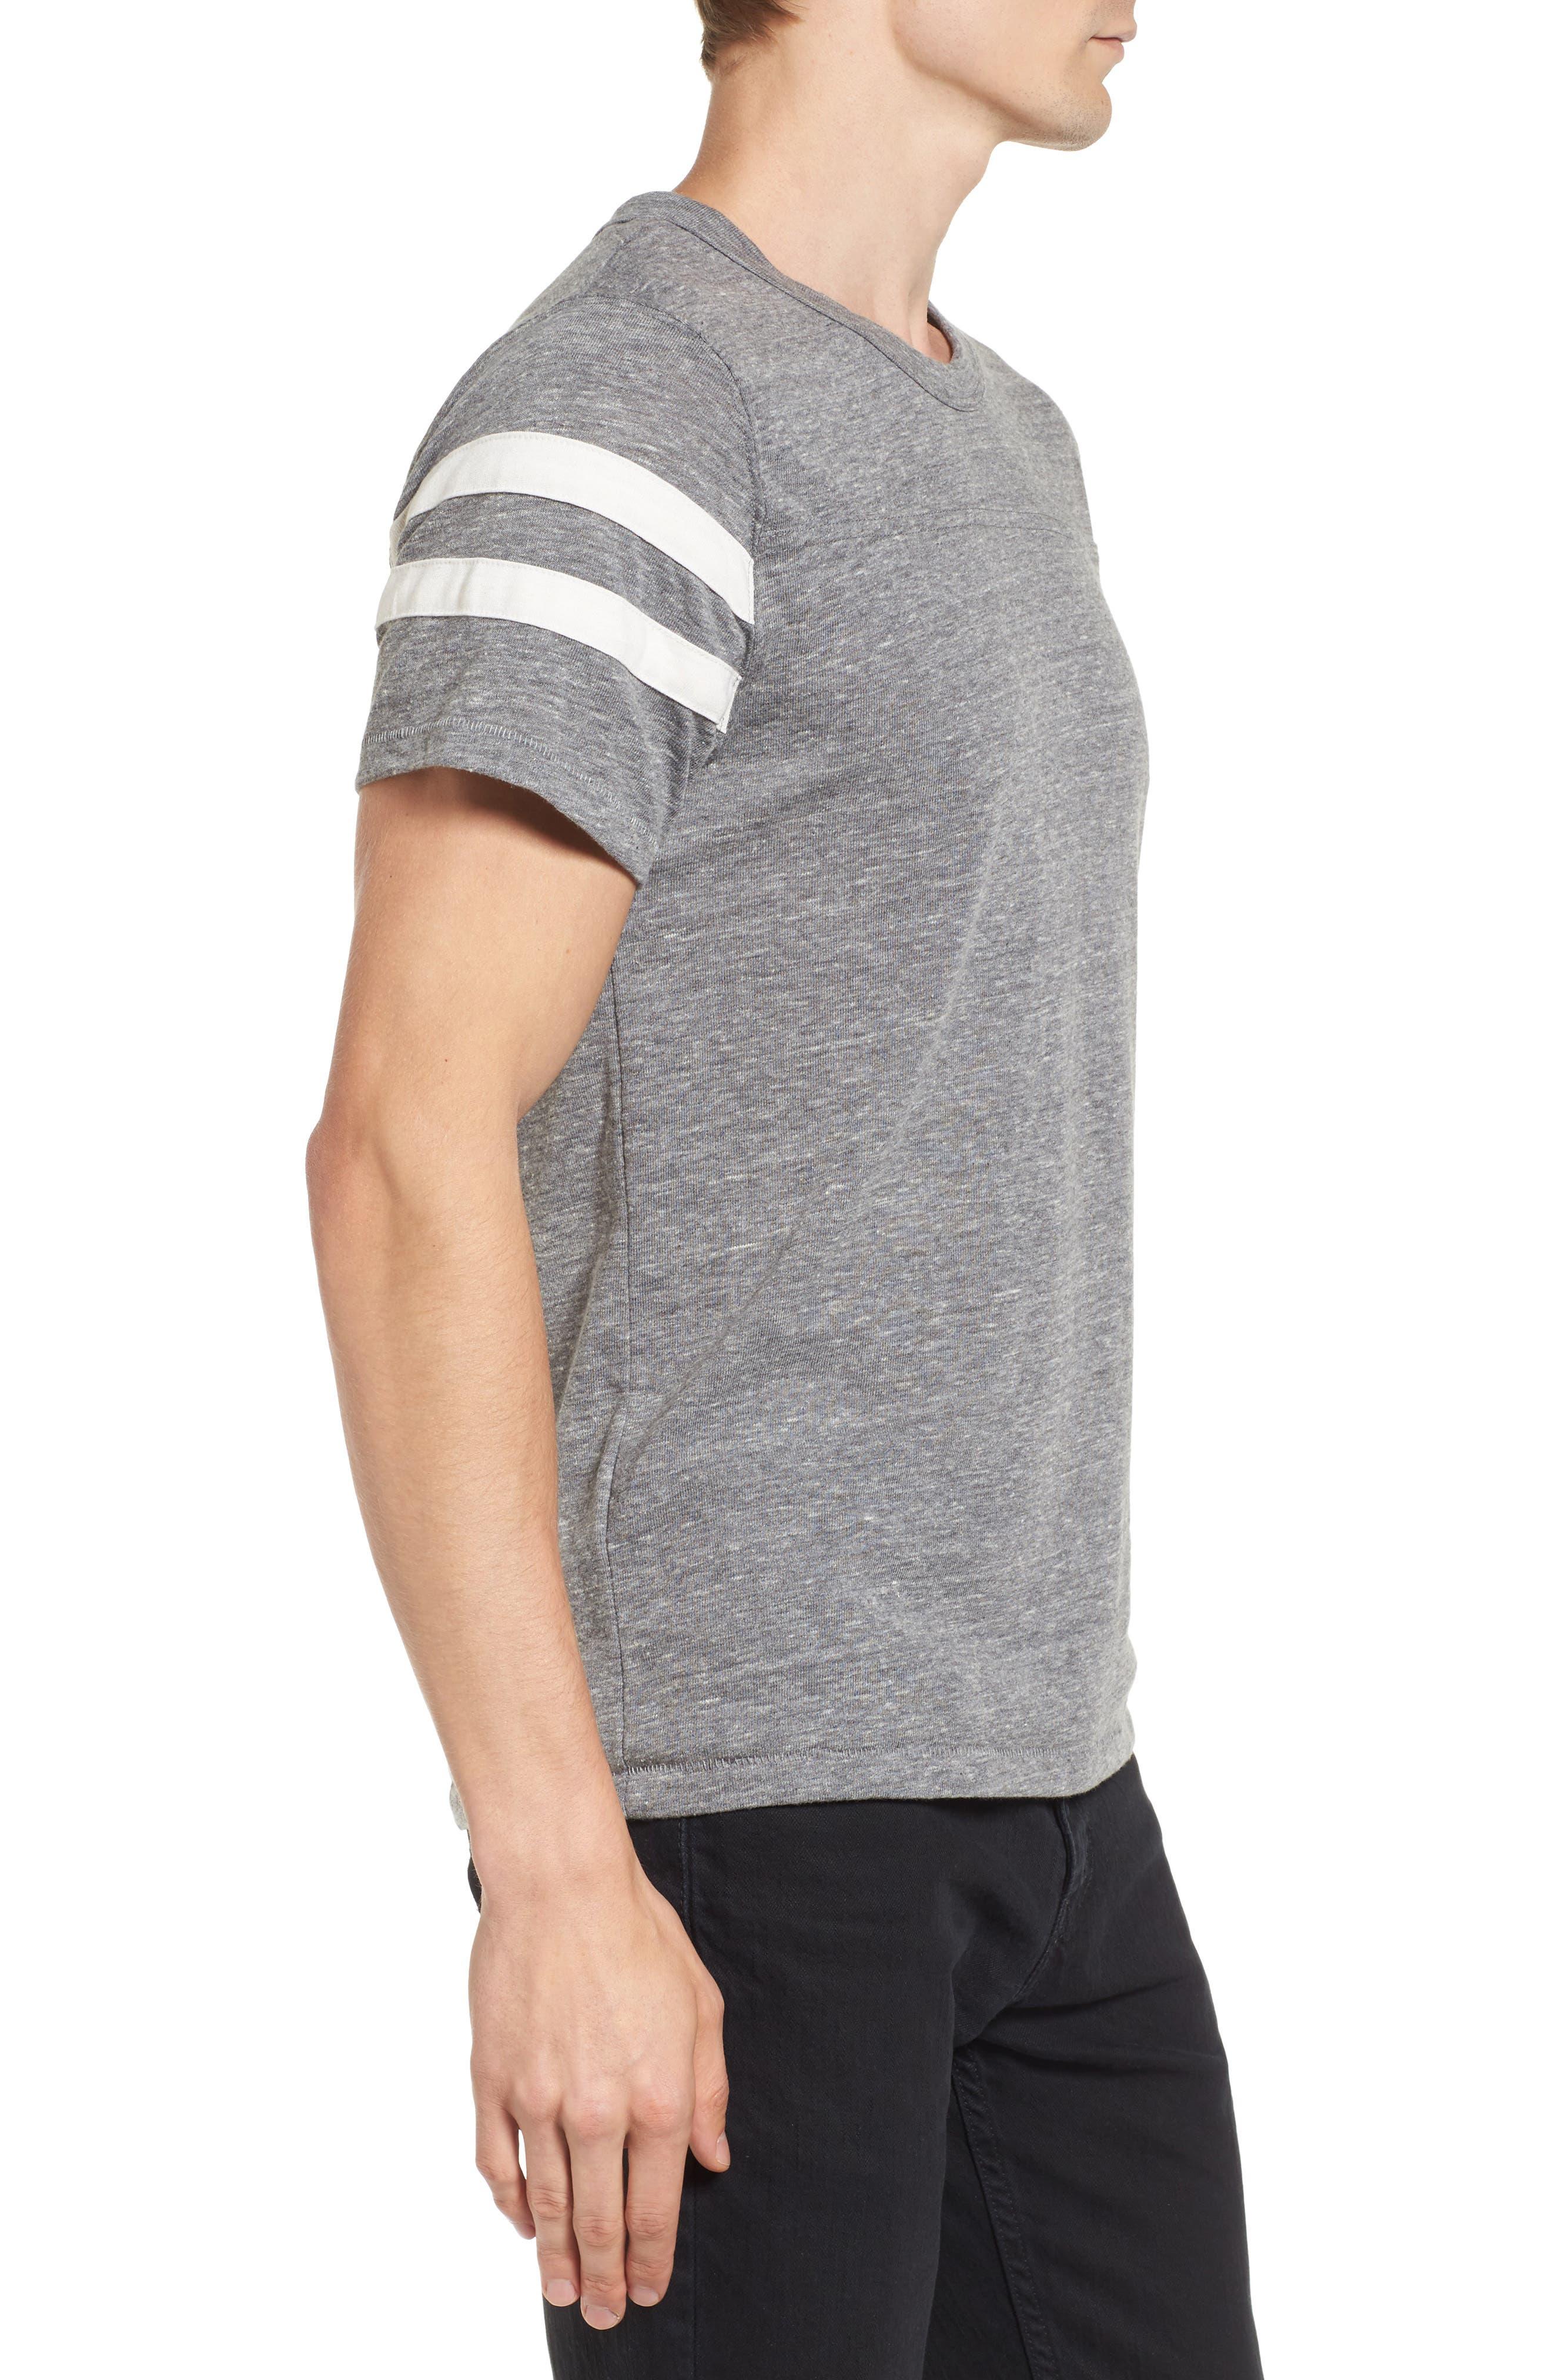 Football T-Shirt,                             Alternate thumbnail 3, color,                             Eco Grey/ Eco Ivory